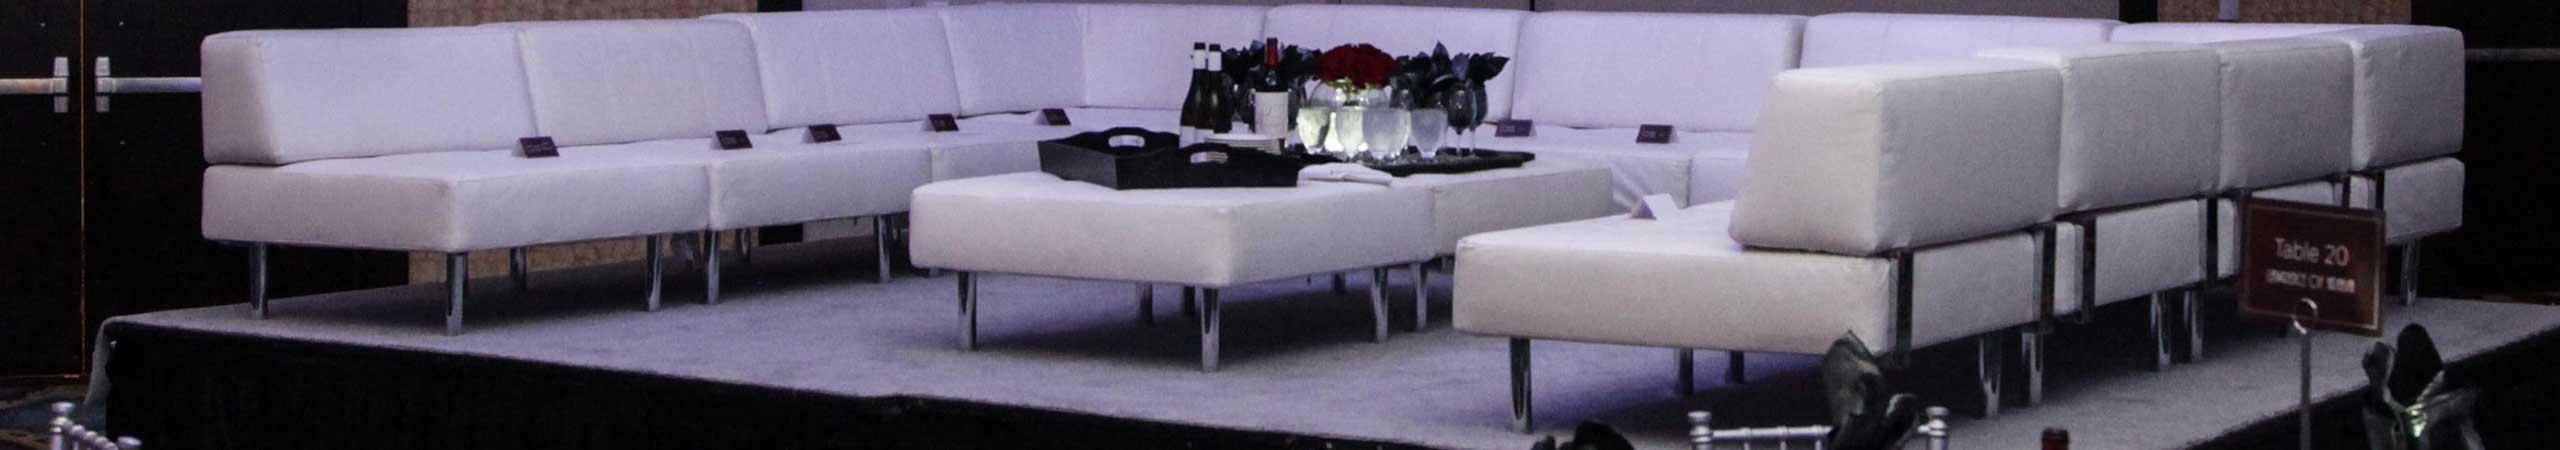 Jacksonville, Seating Event Furniture Rentals